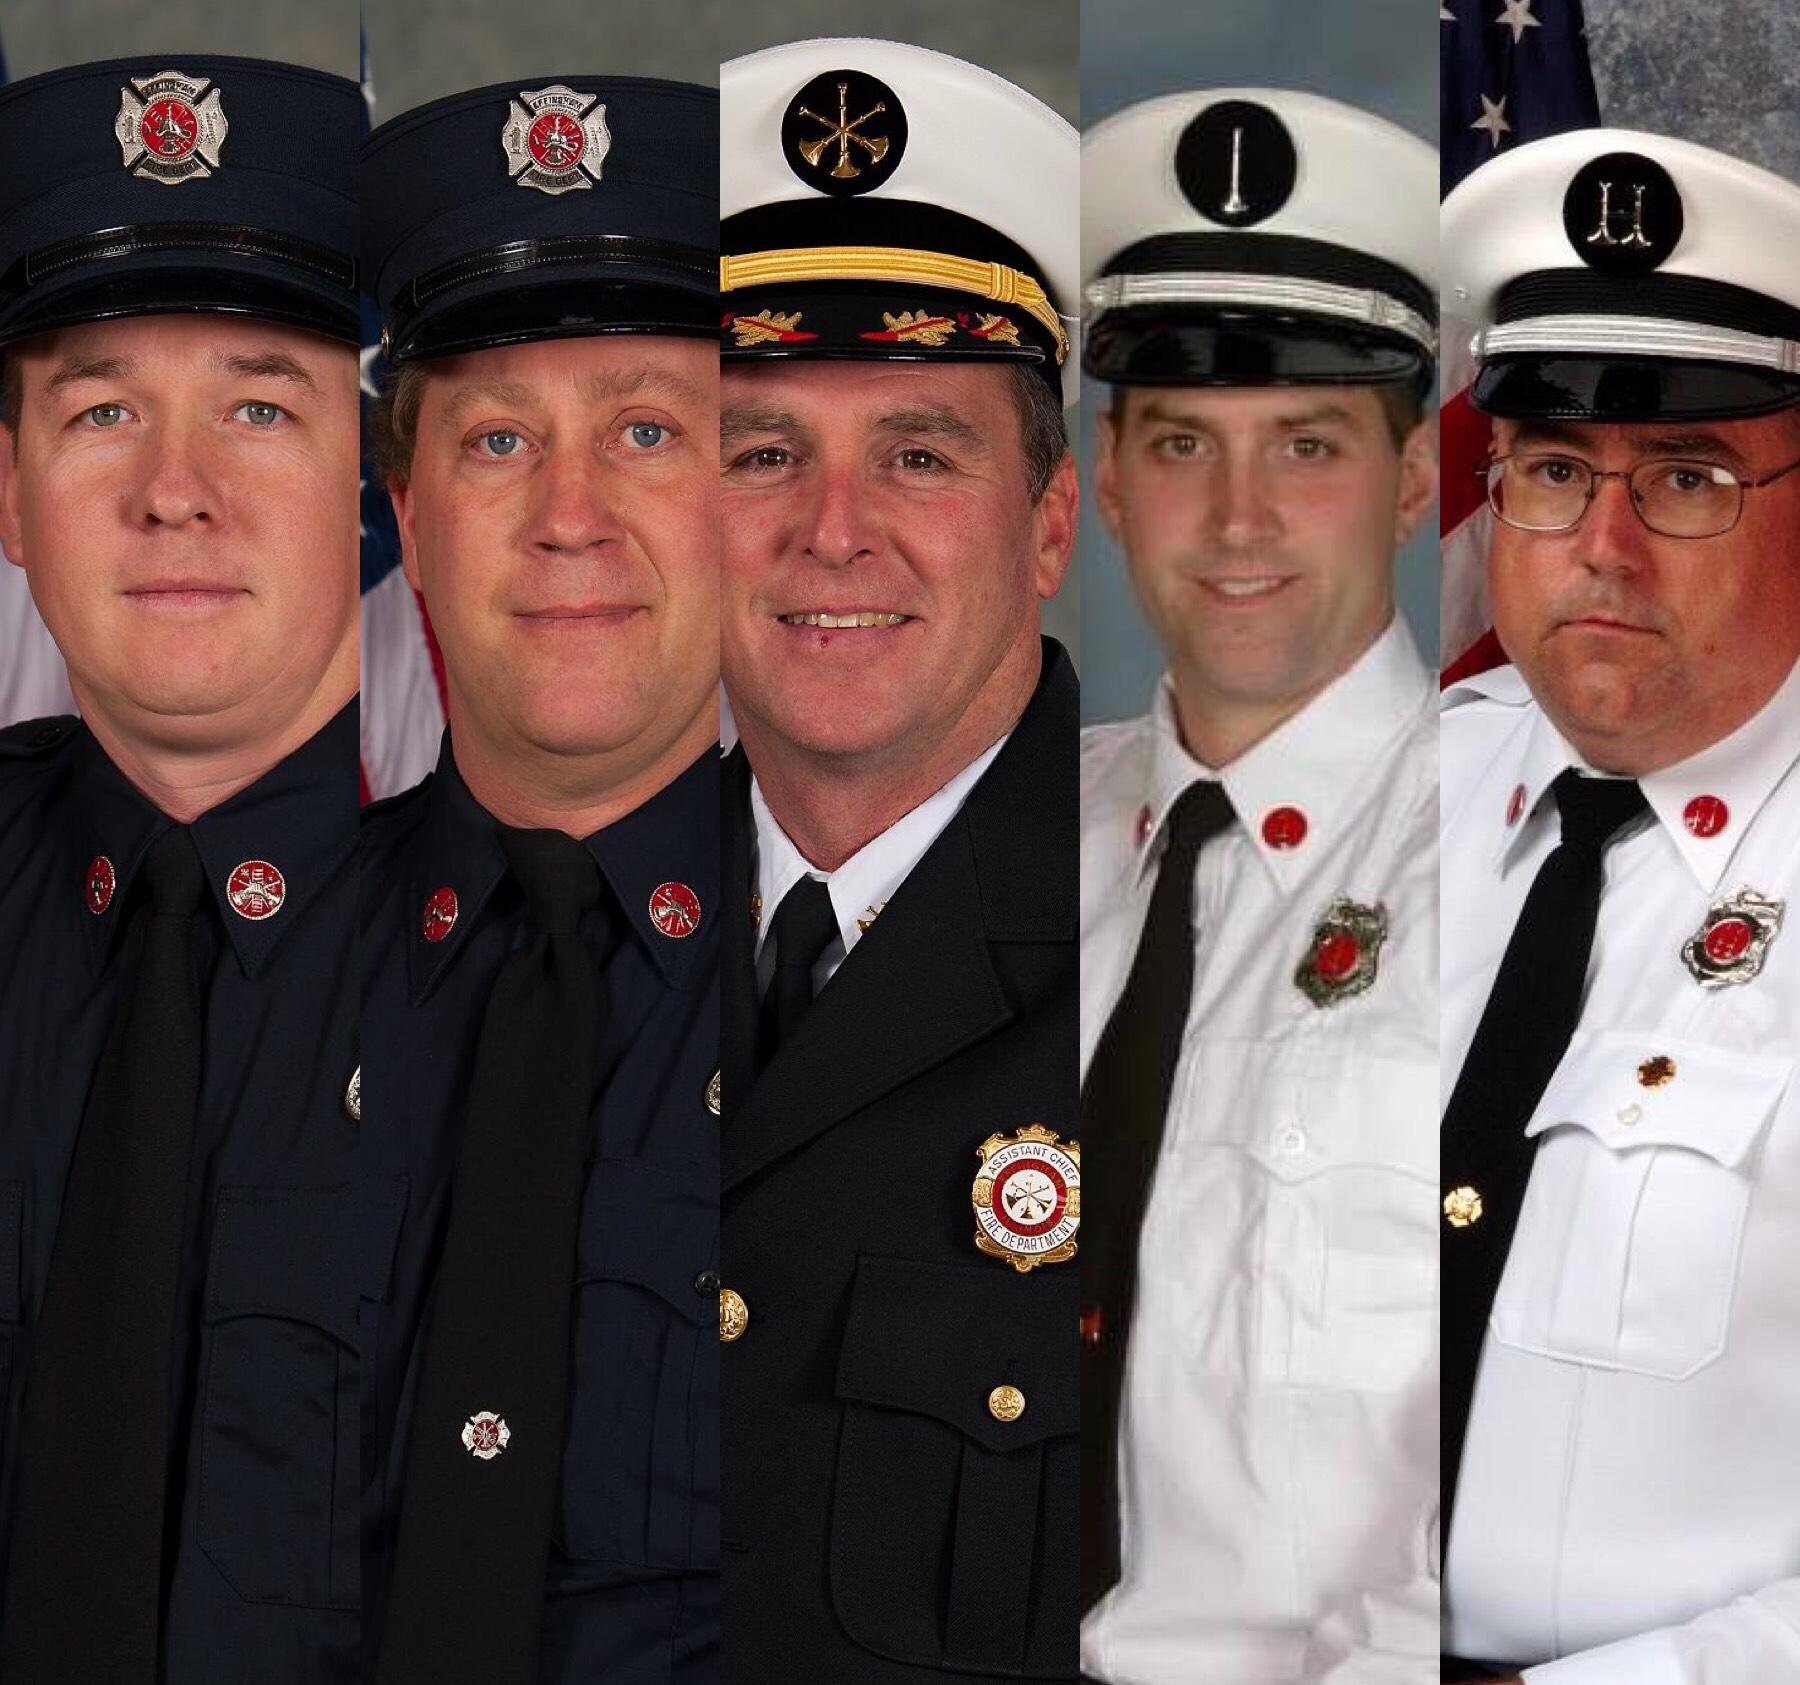 Local Firefighters Win Midwest Regional First Regional Award